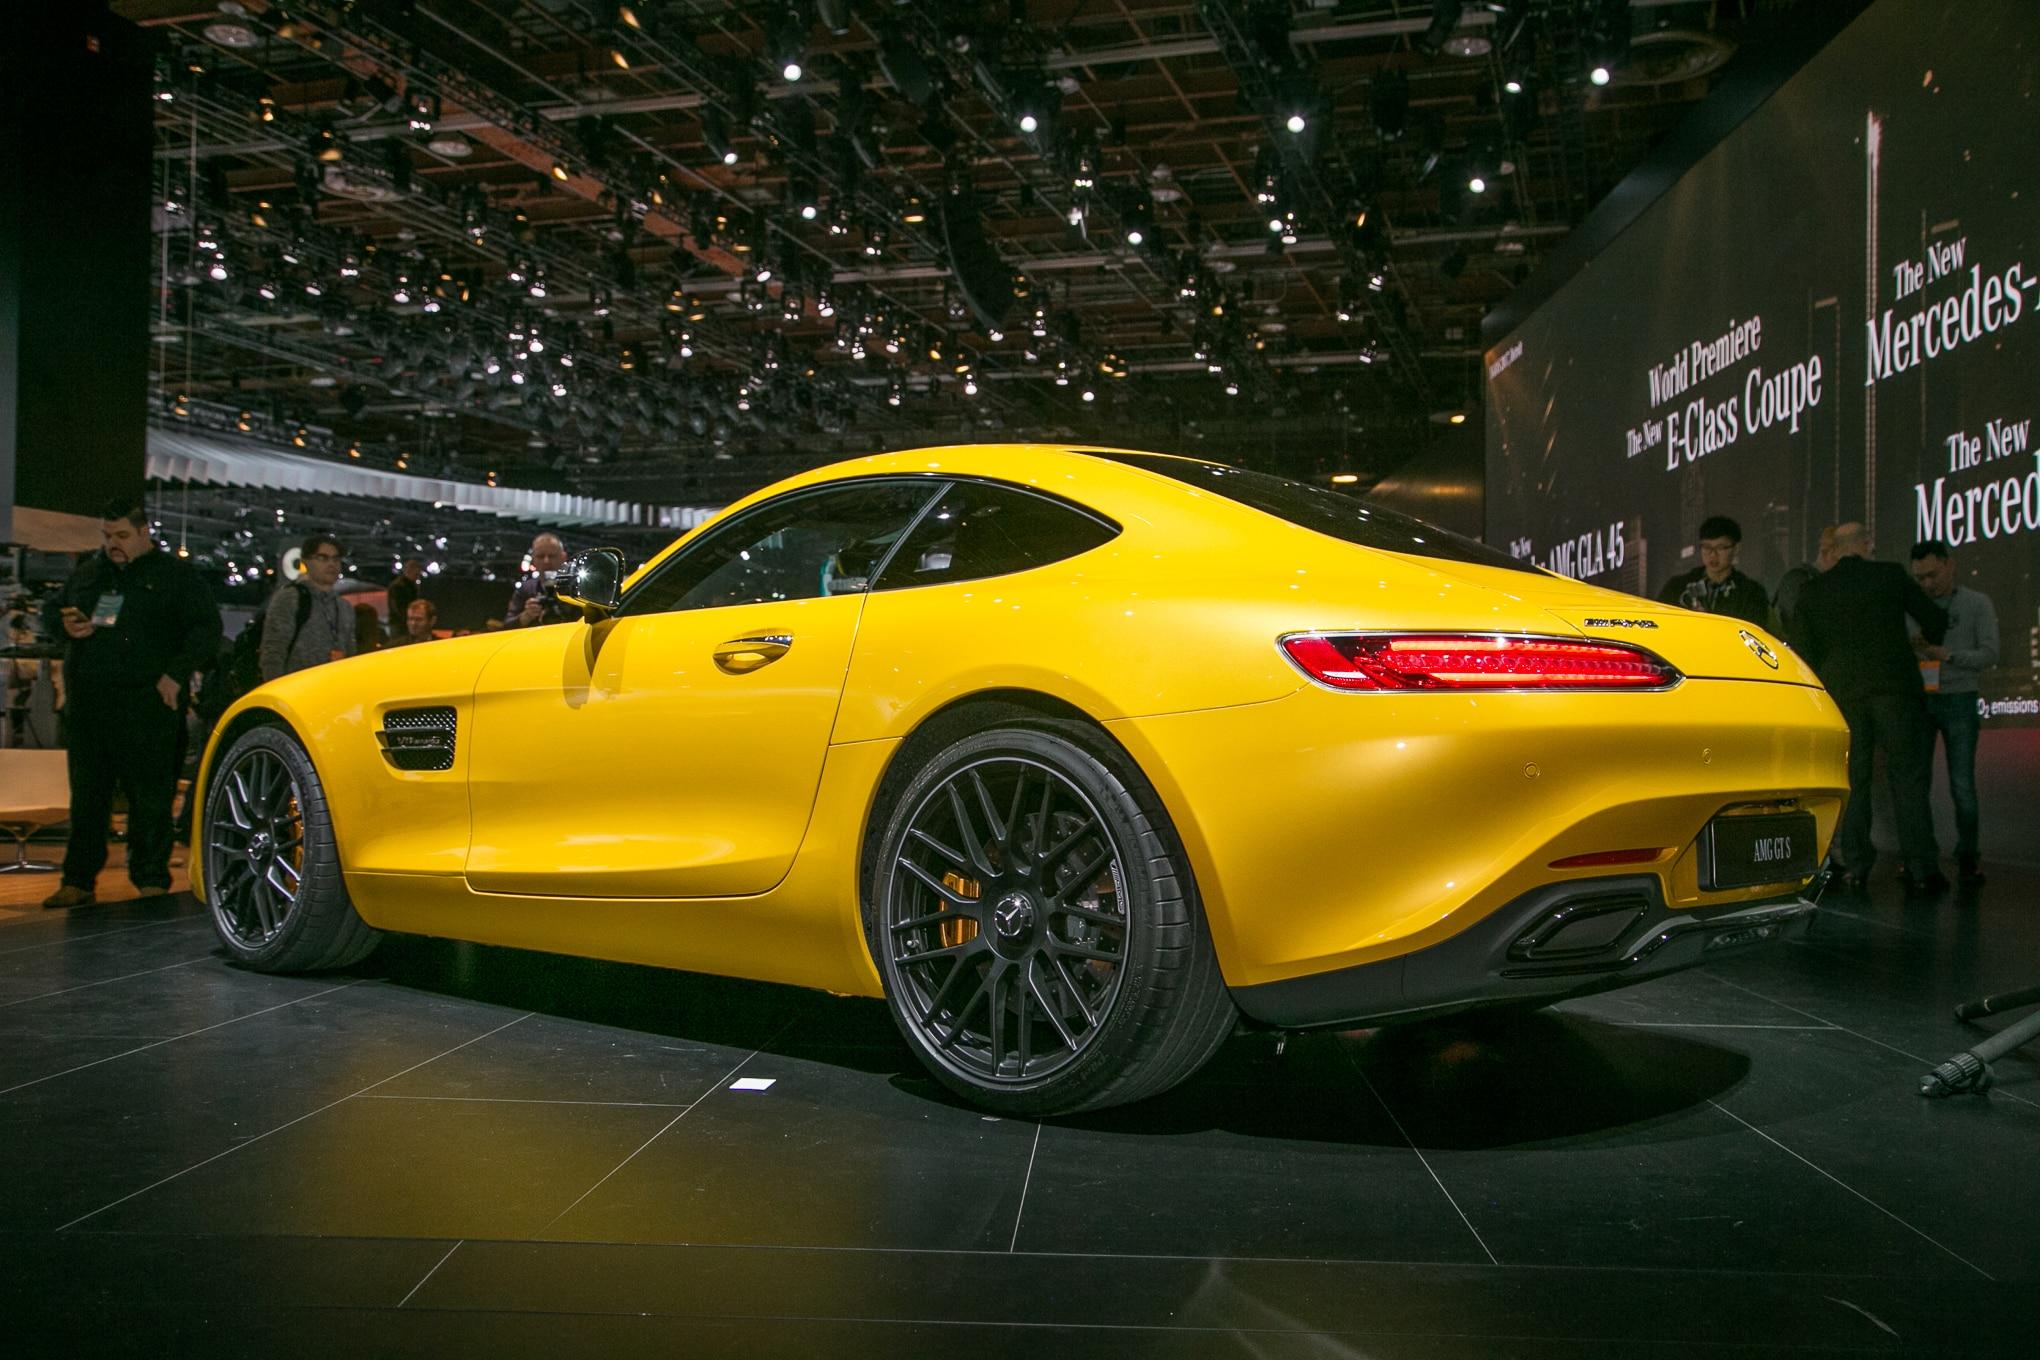 German Artega Firm Plans New Sports Car Models